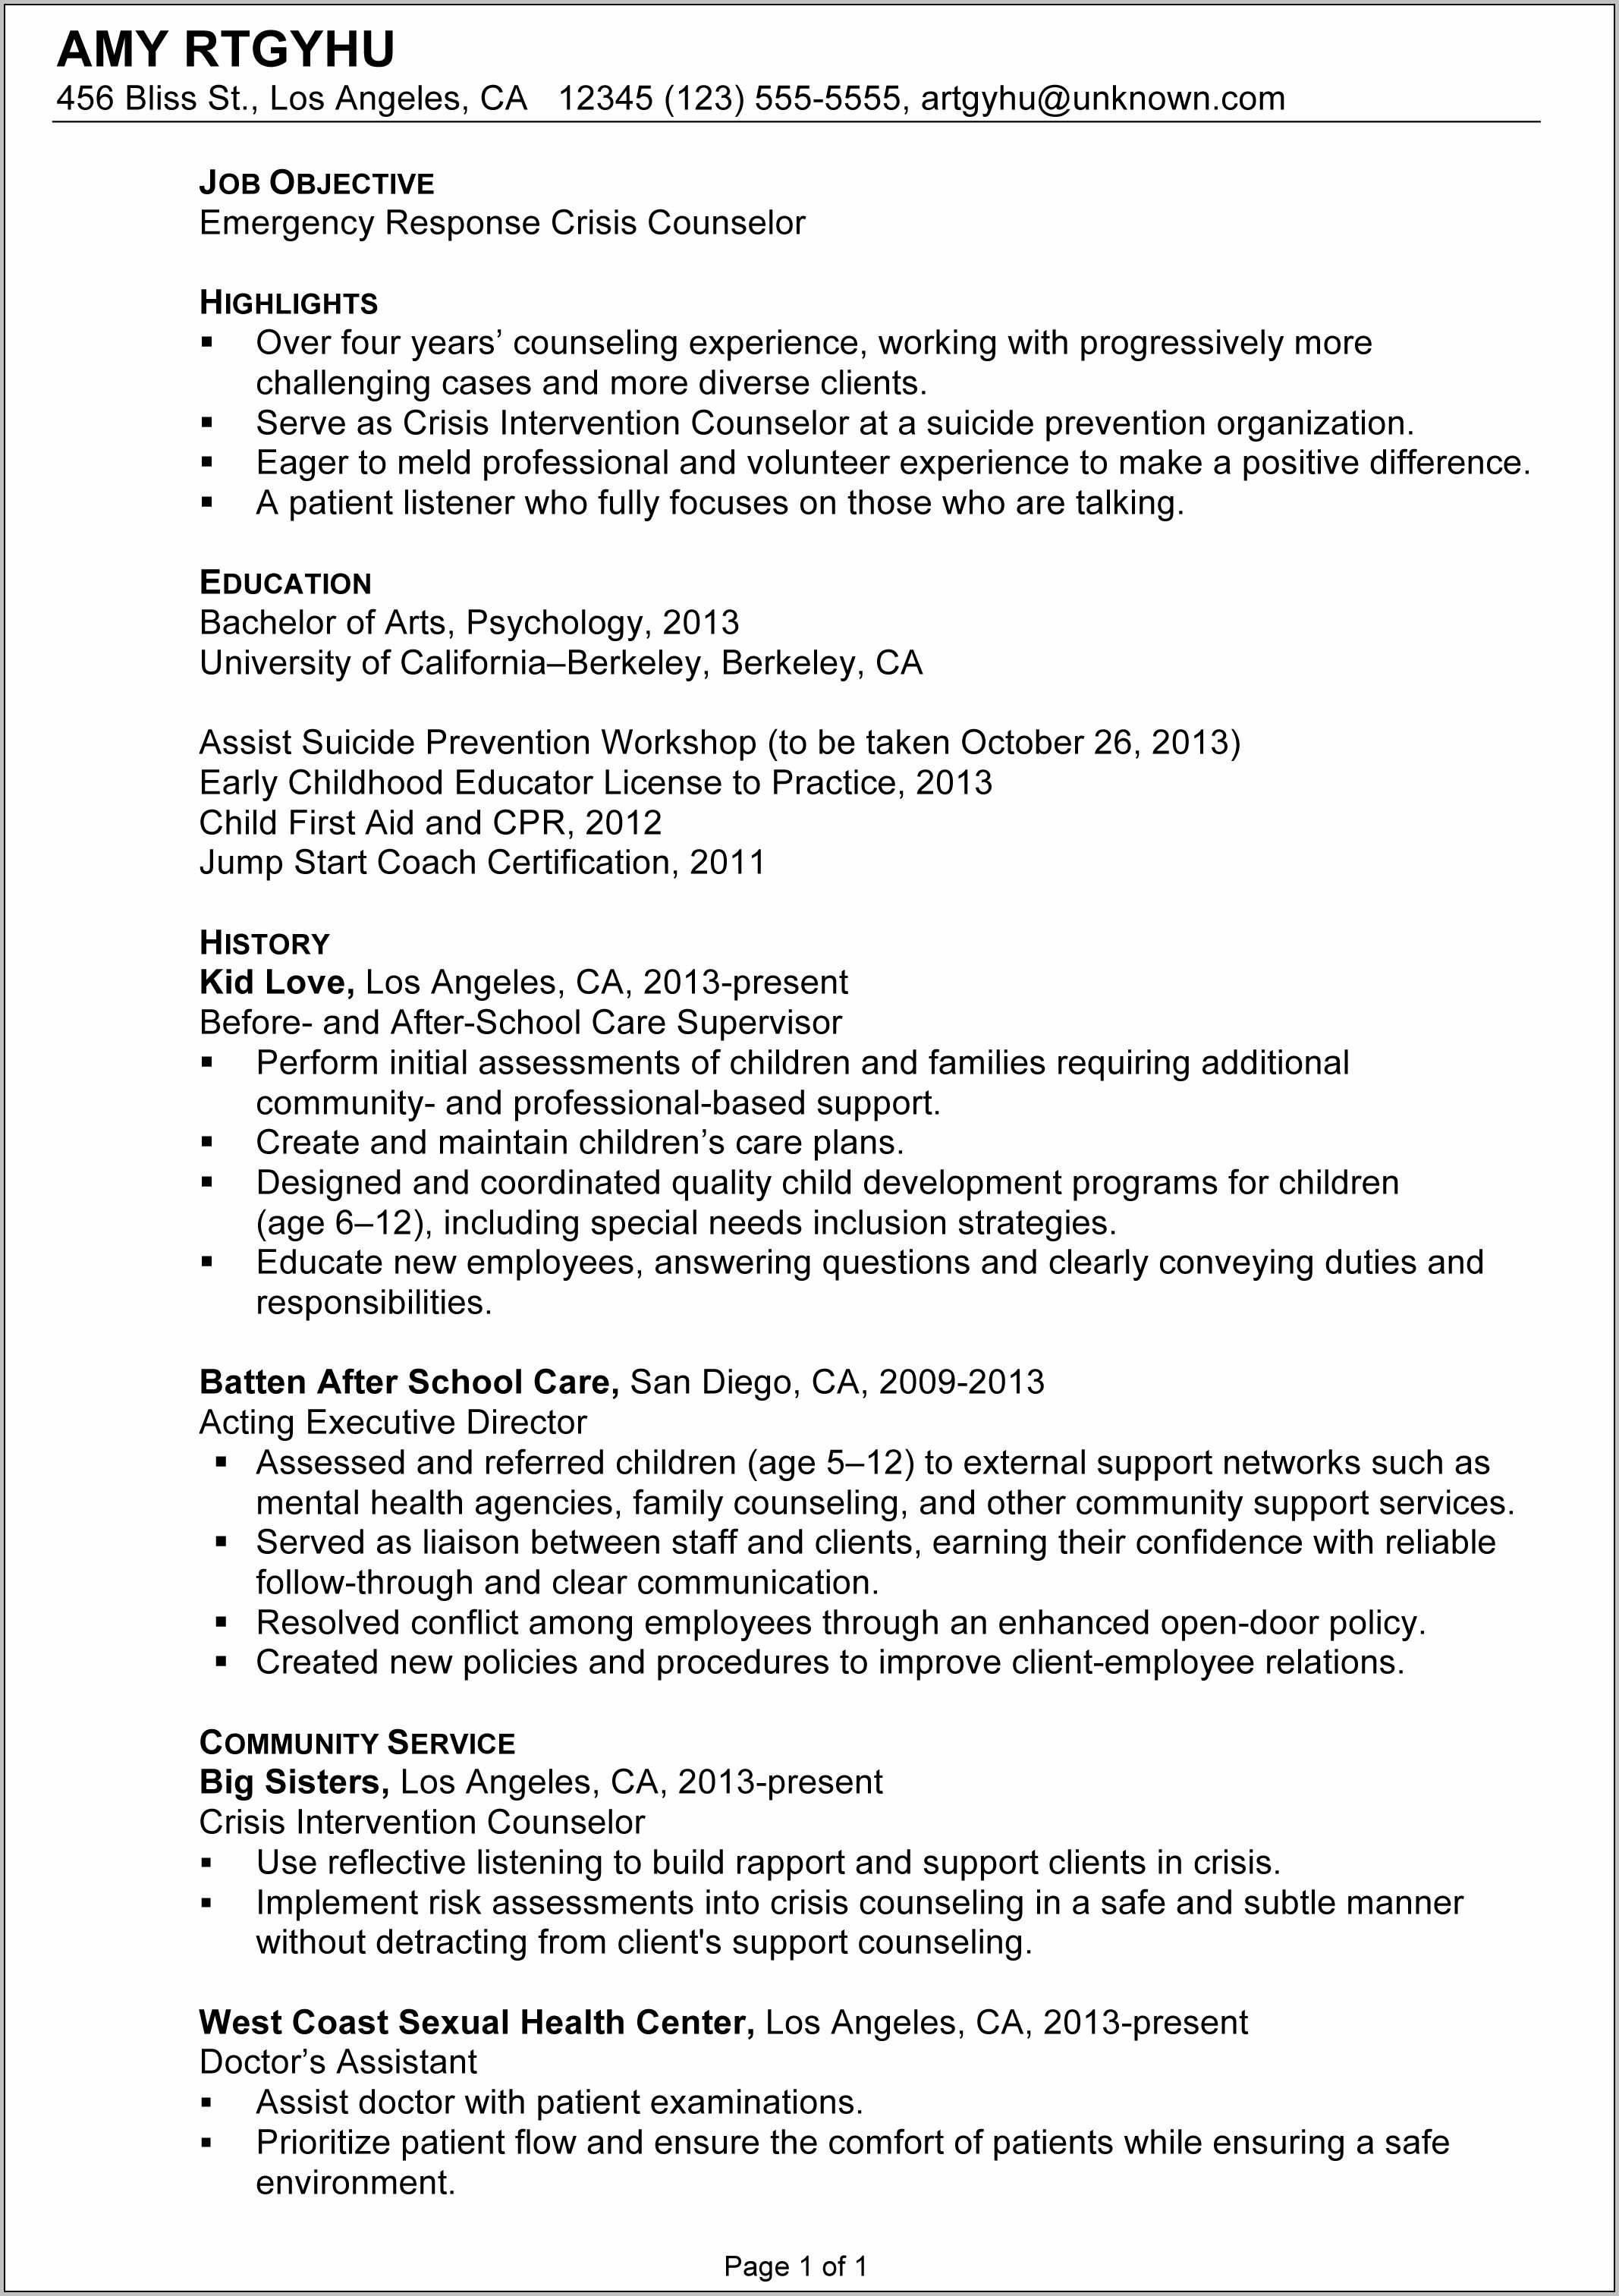 Sample Employee Handbook For Child Care Center